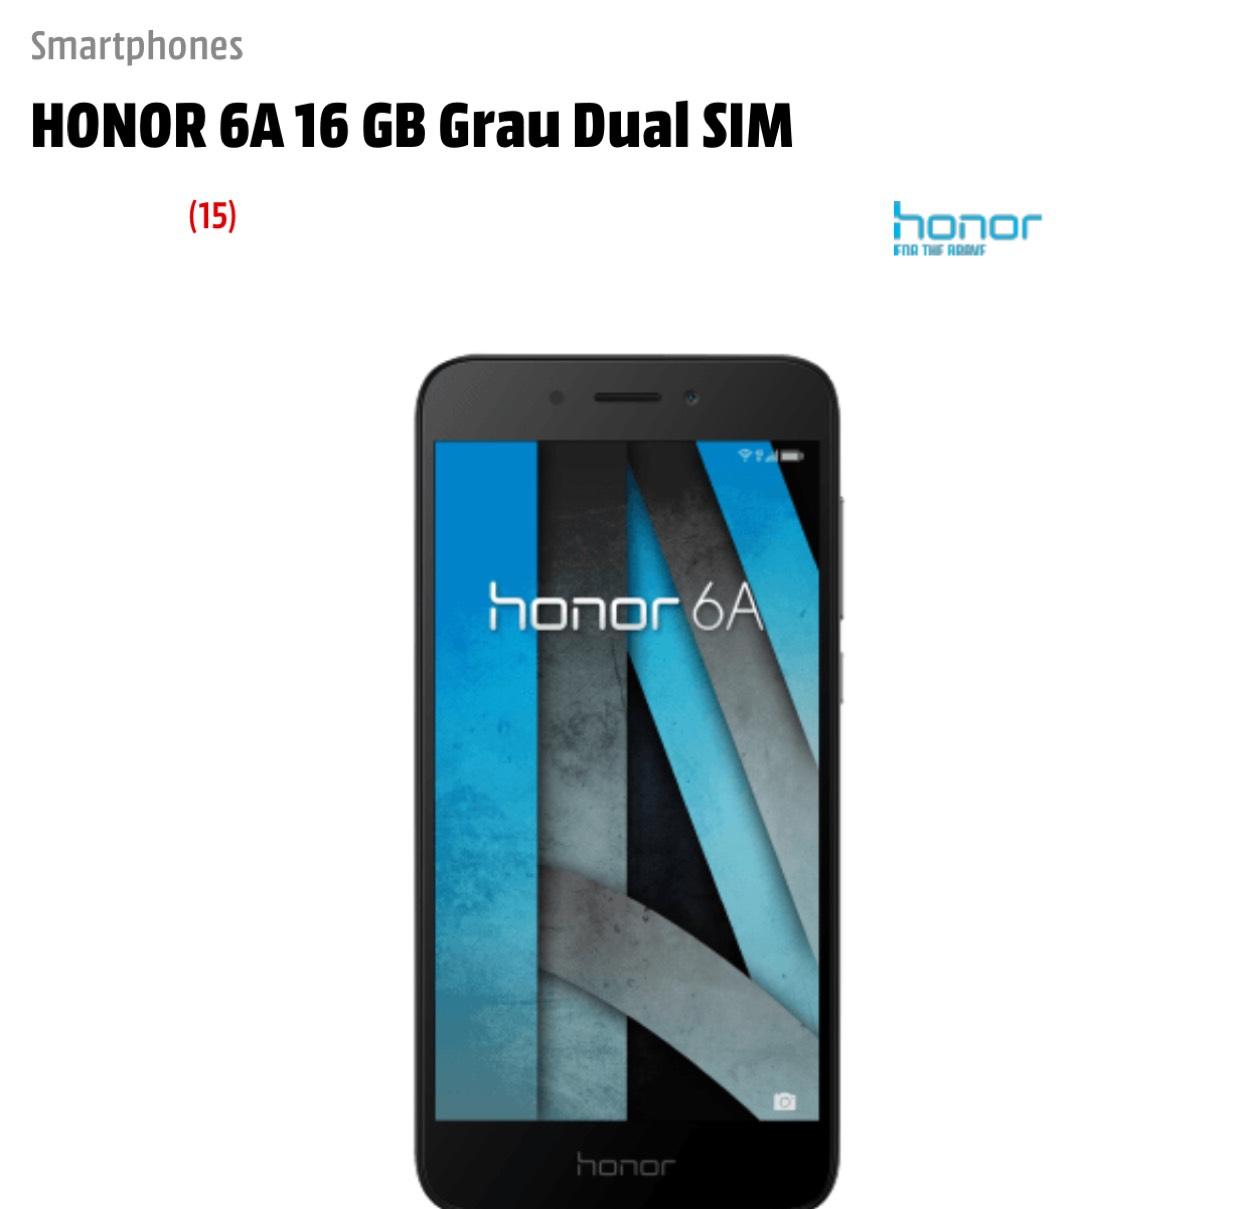 Honor 6A 16GB (keine VK)